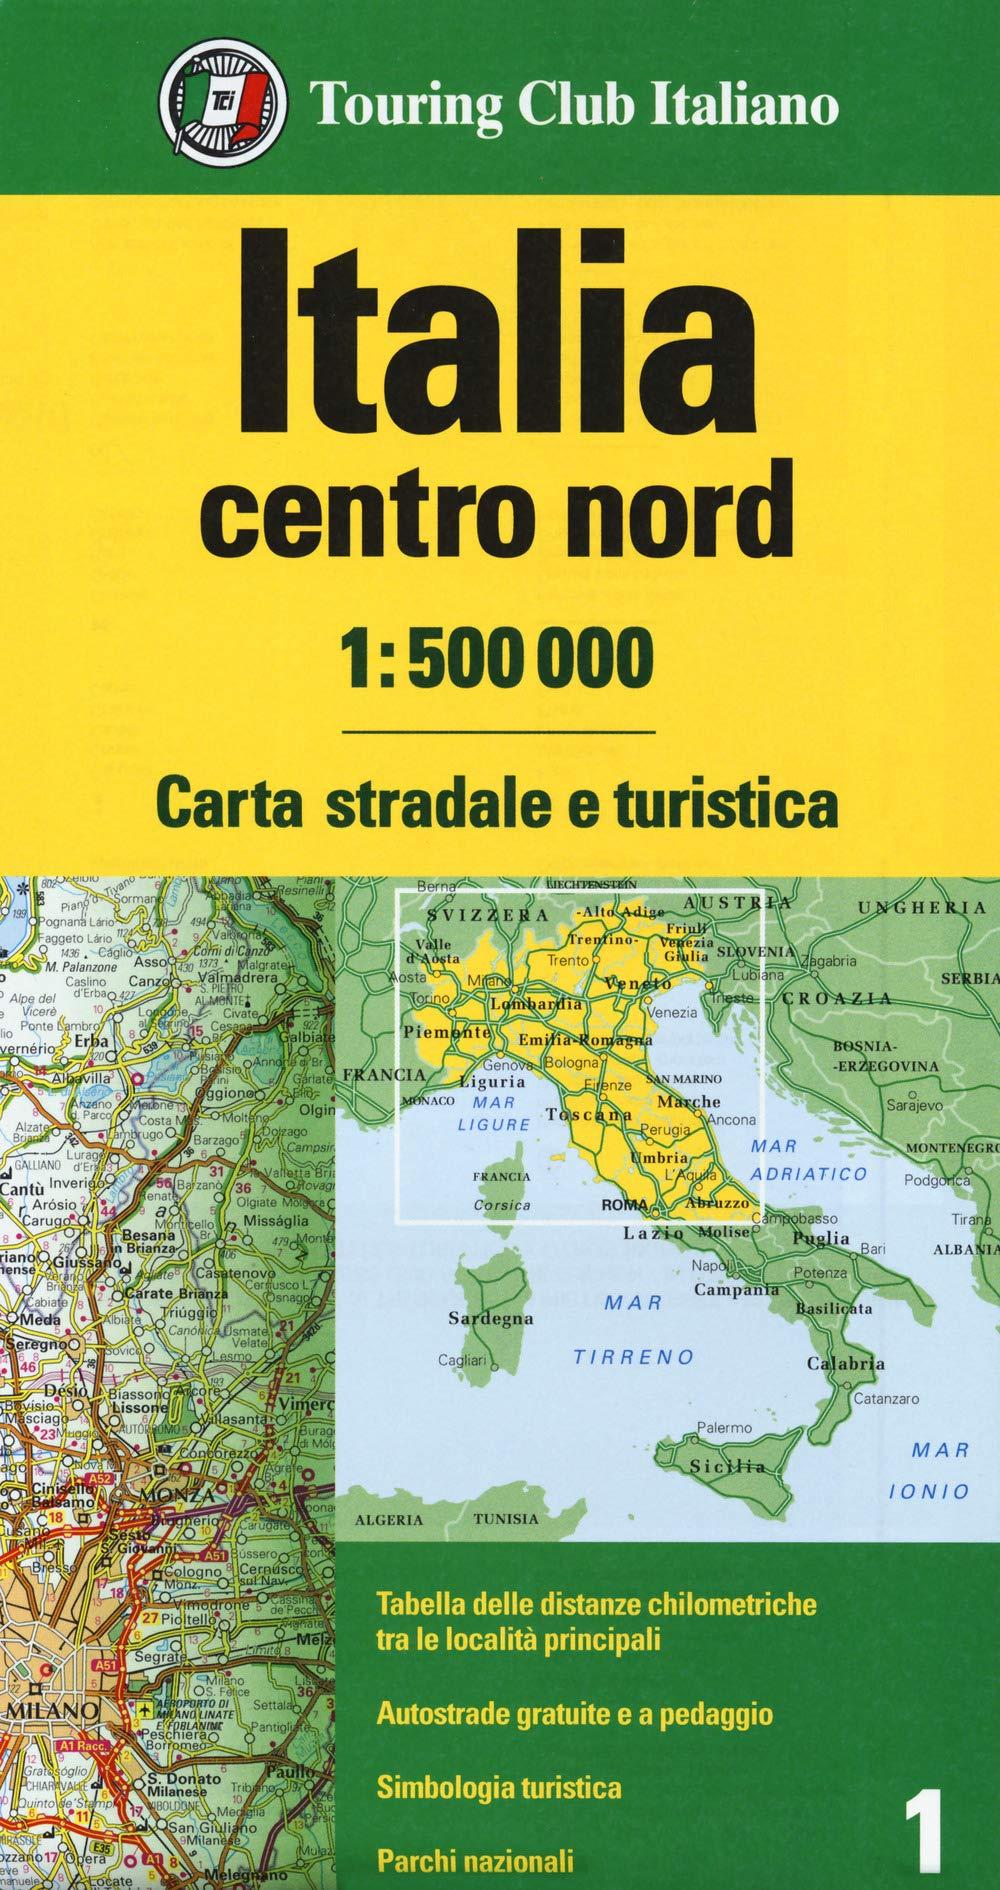 Italia Centro nord Cartina